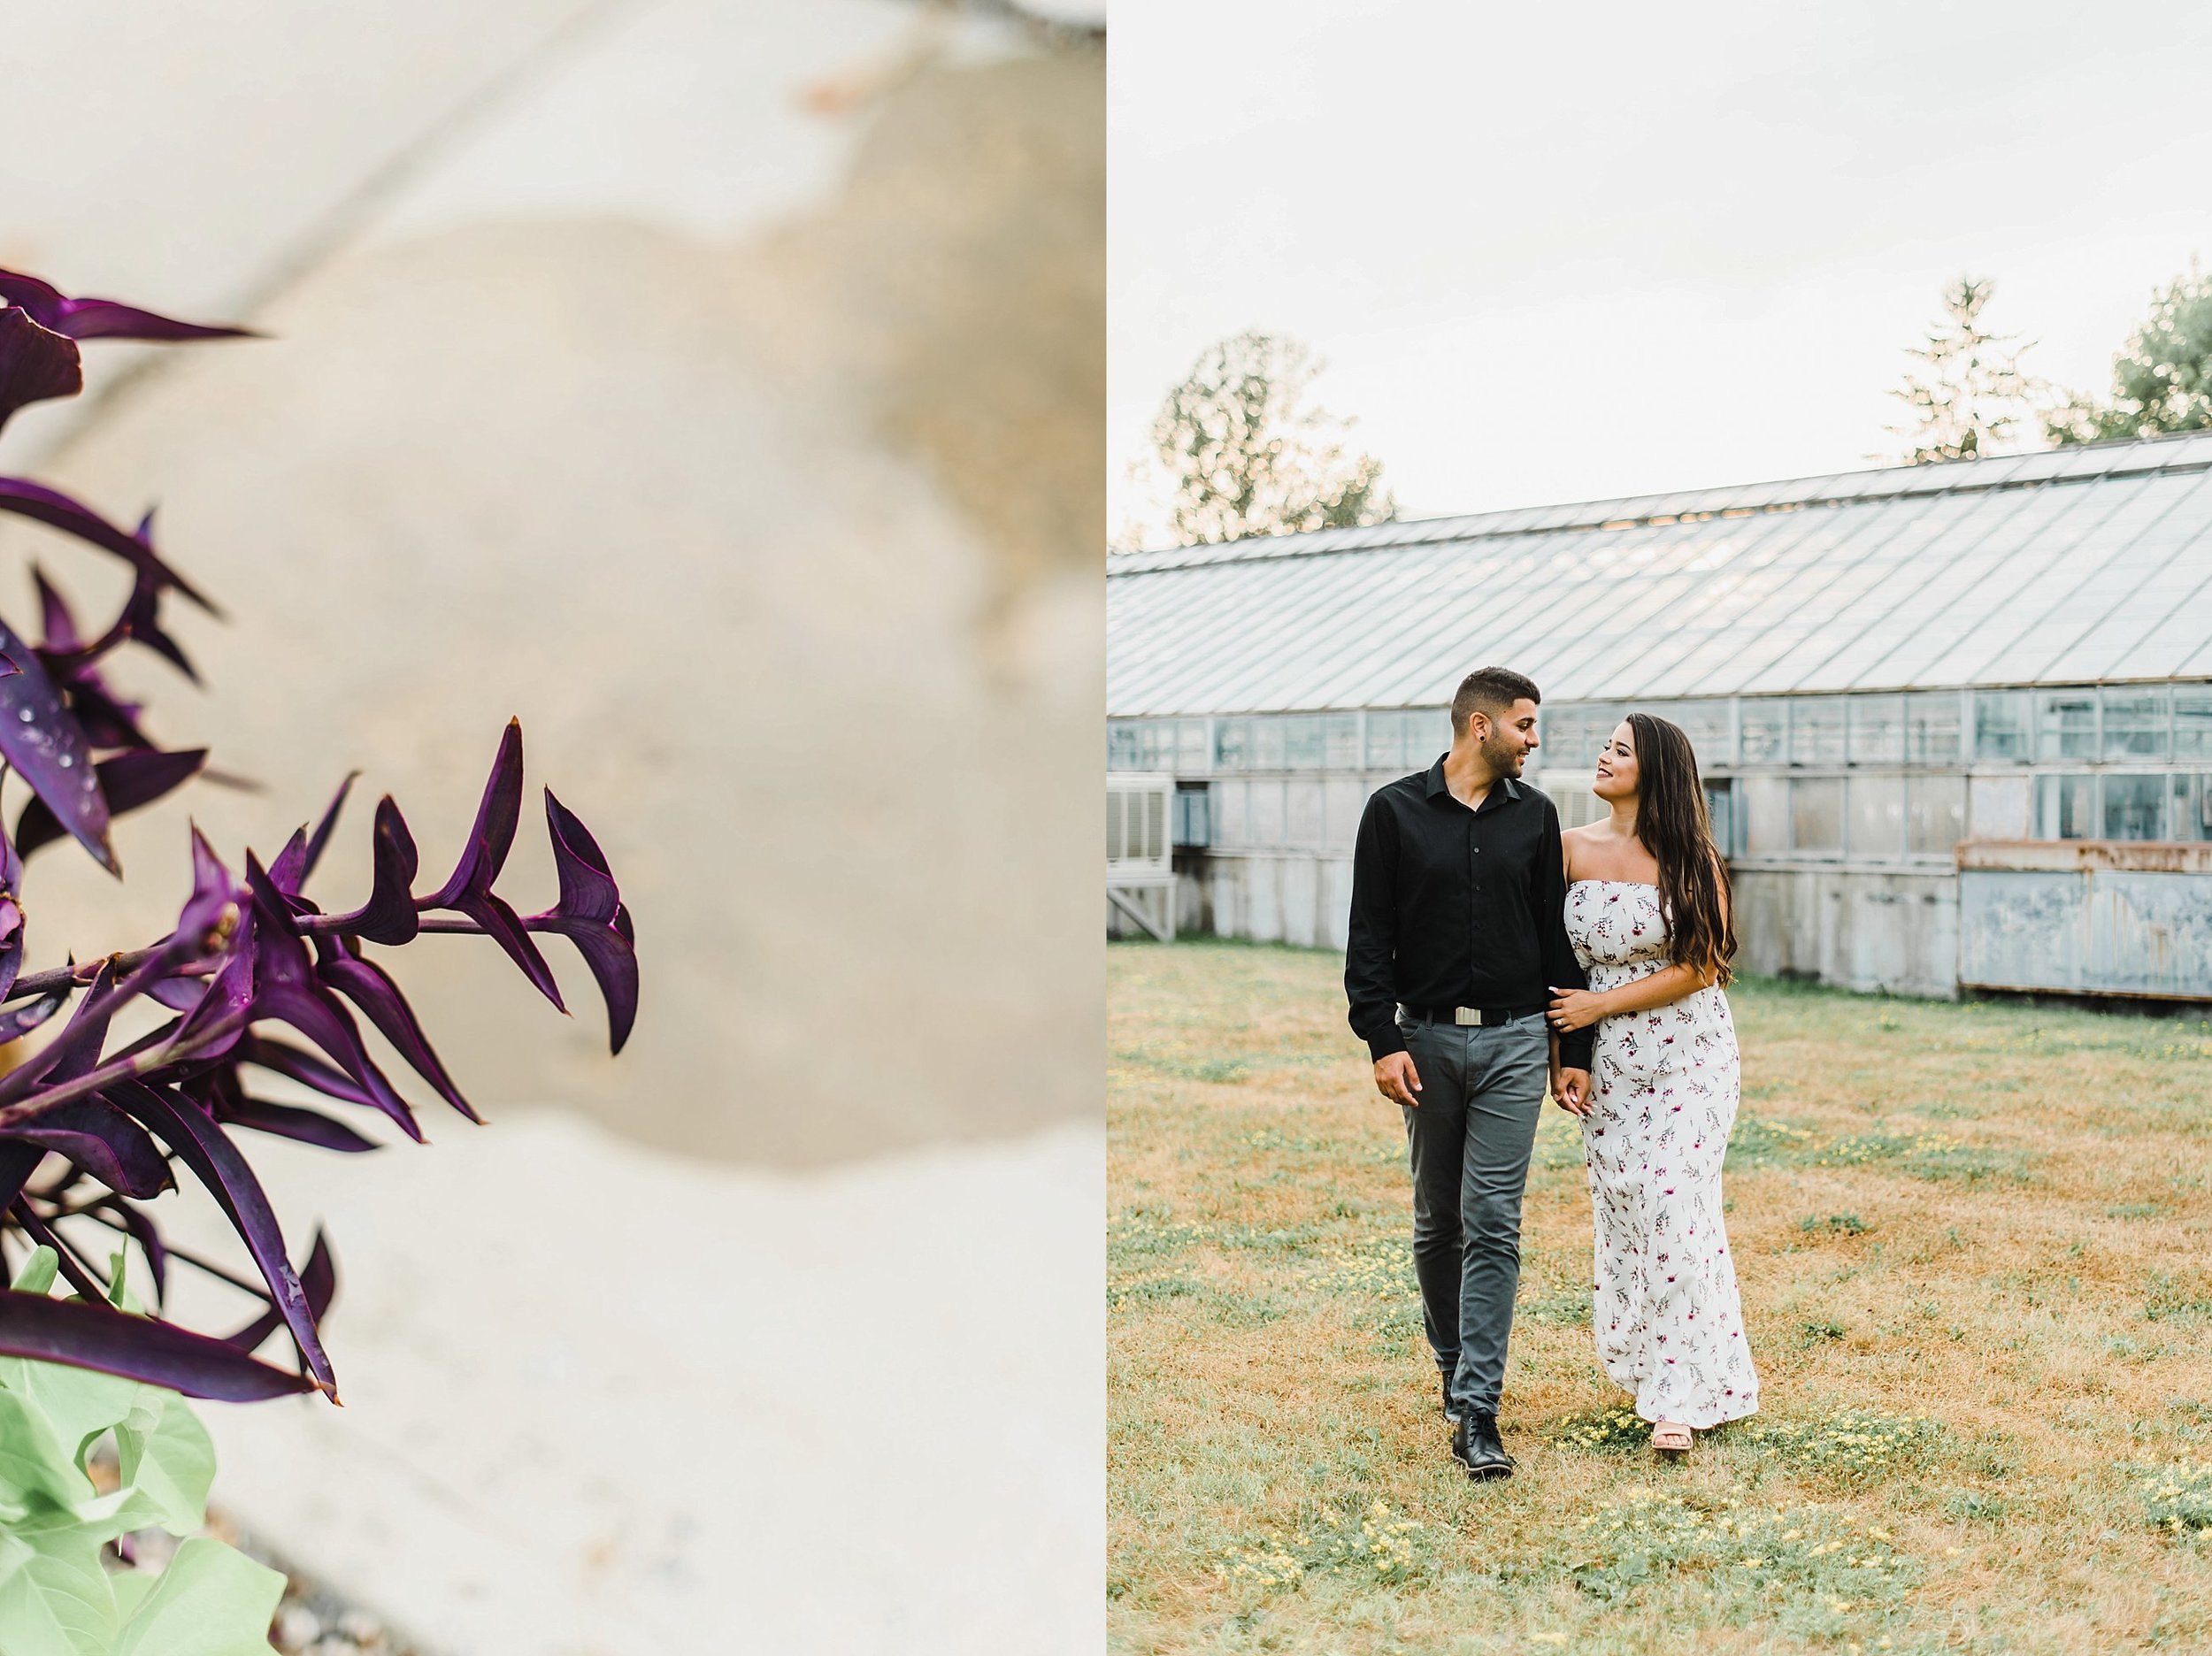 light airy indie fine art ottawa wedding photographer | Ali and Batoul Photography_0957.jpg